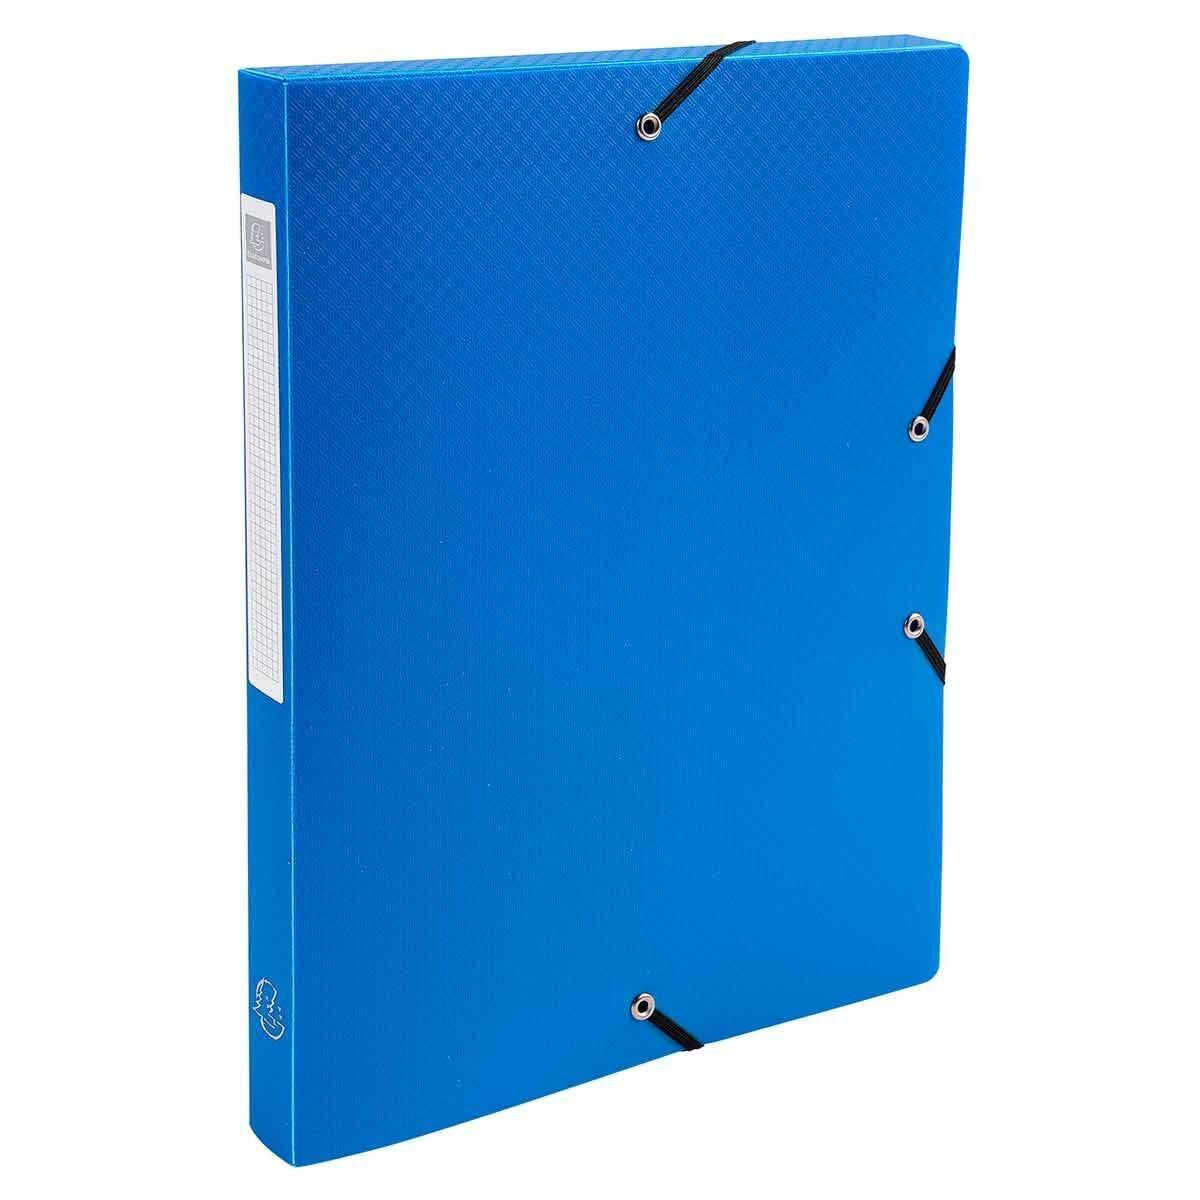 Exacompta Elasticated Polypropylene Box File A4 25mm Pack of 8 Blue